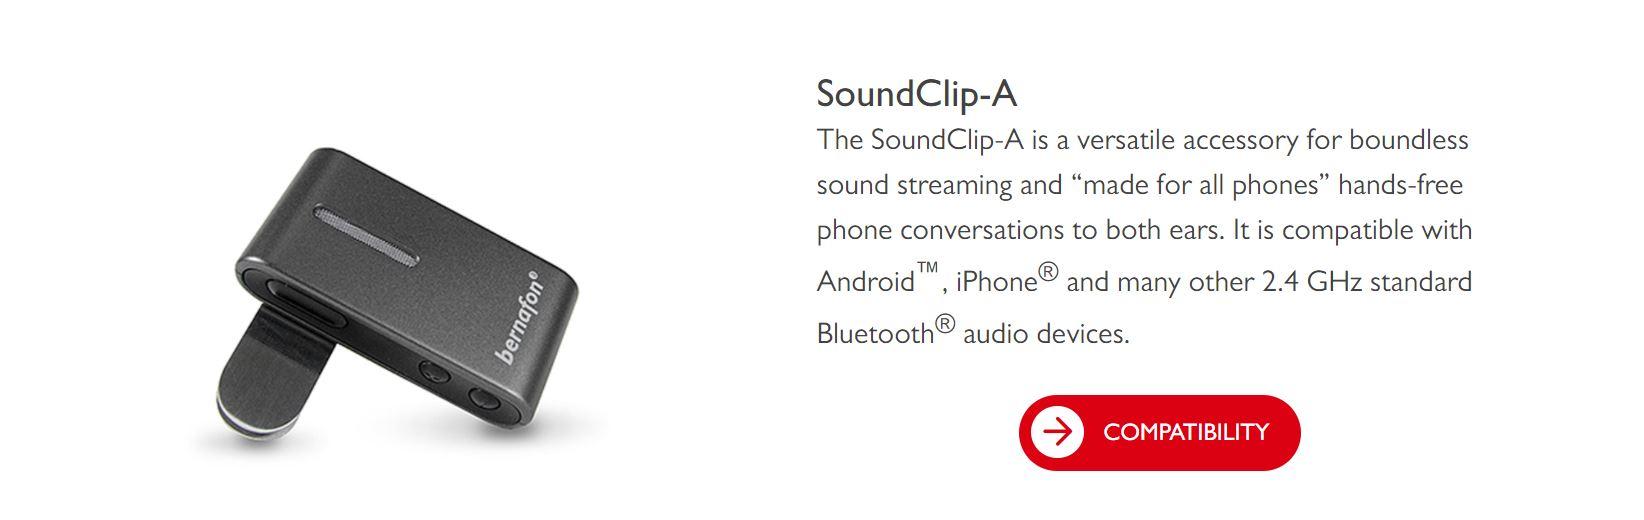 soundclip a has showed up on costco bernafon website hearing aids